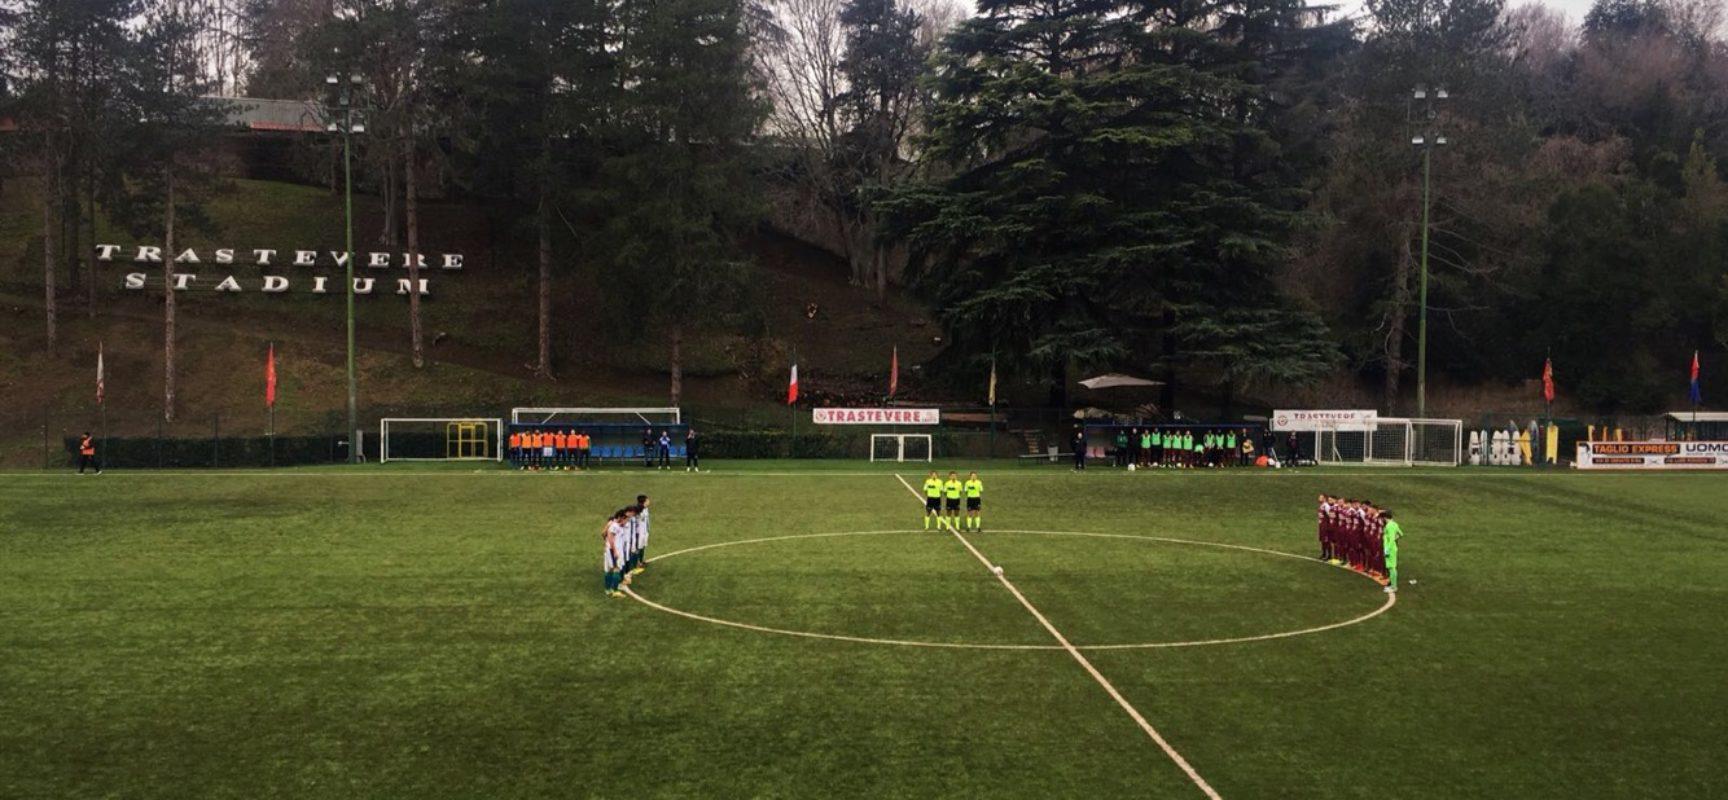 Trastevere-Nuorese 3-2